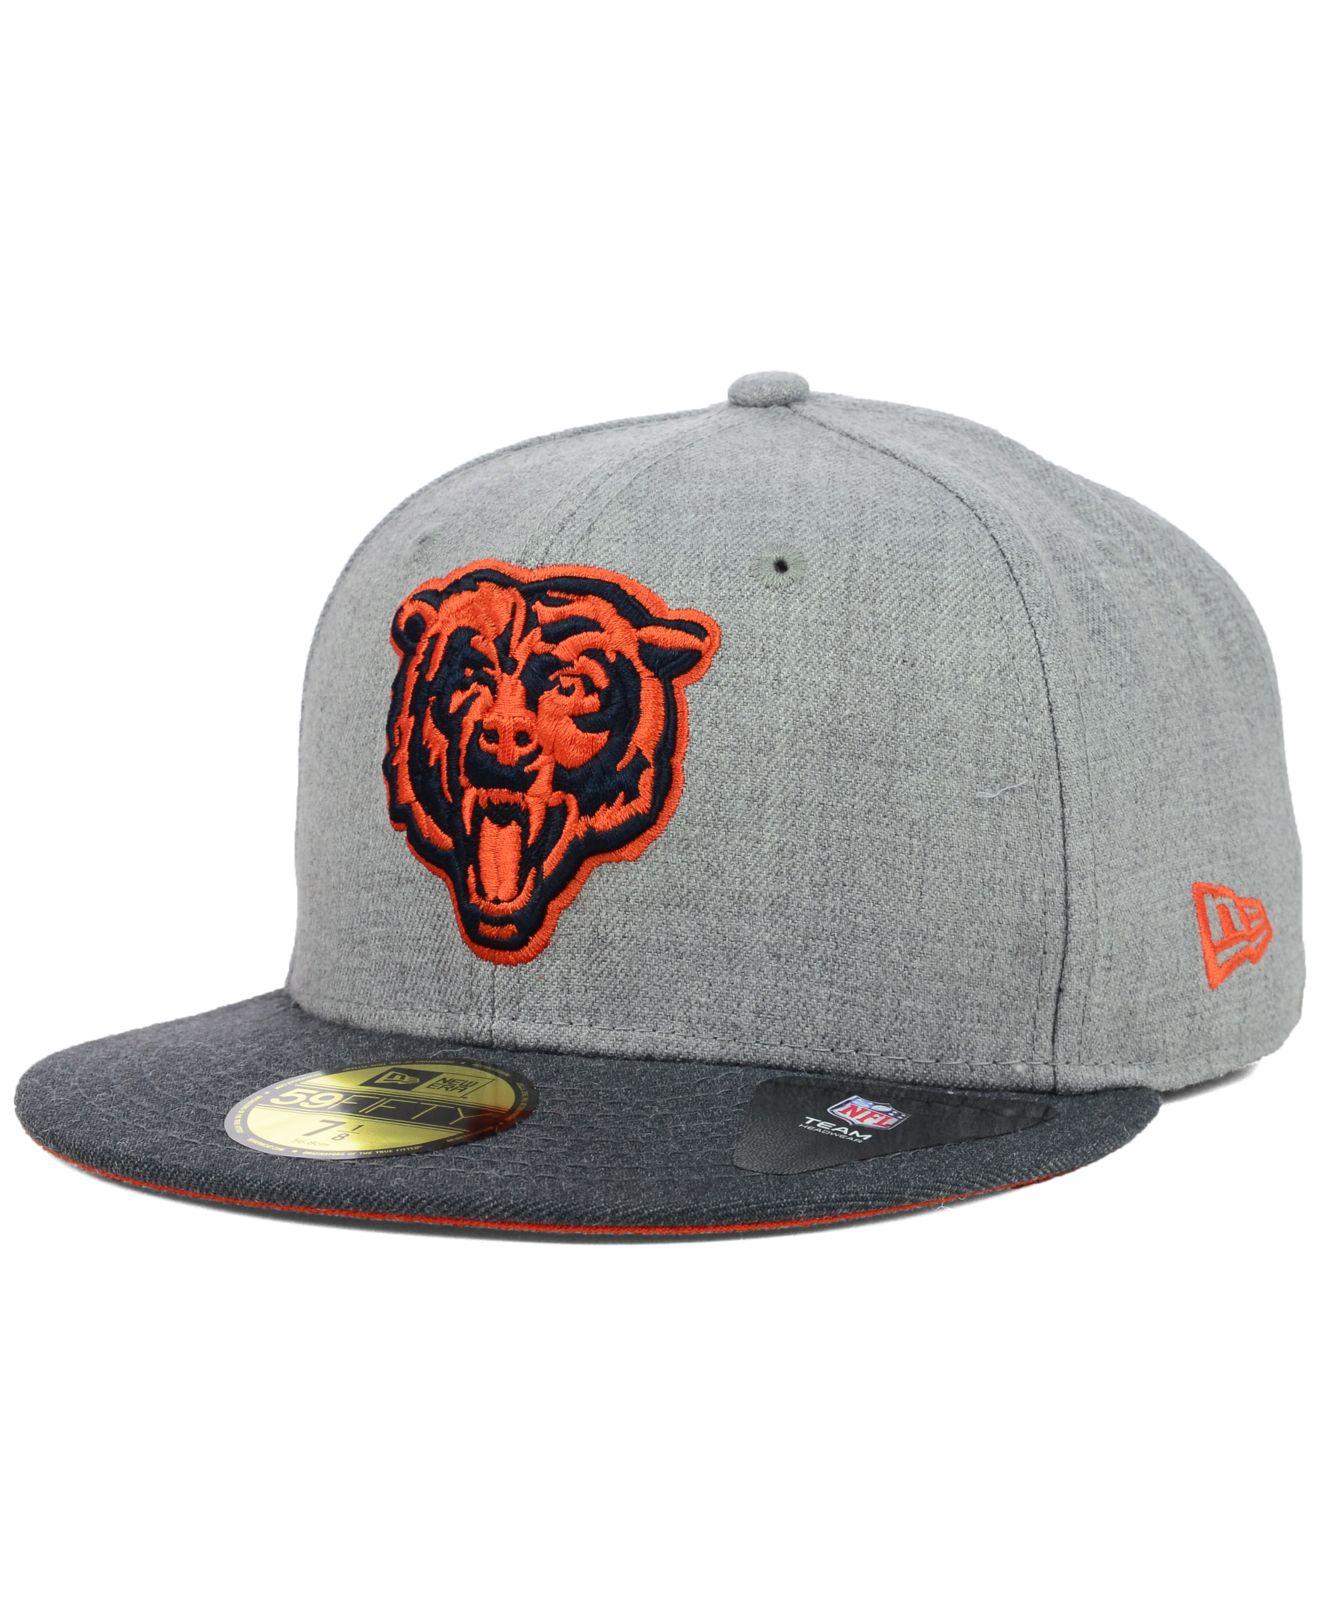 f83de8ad3ee Lyst - KTZ Chicago Bears Heather 2-Tone 59Fifty Cap in Gray for Men